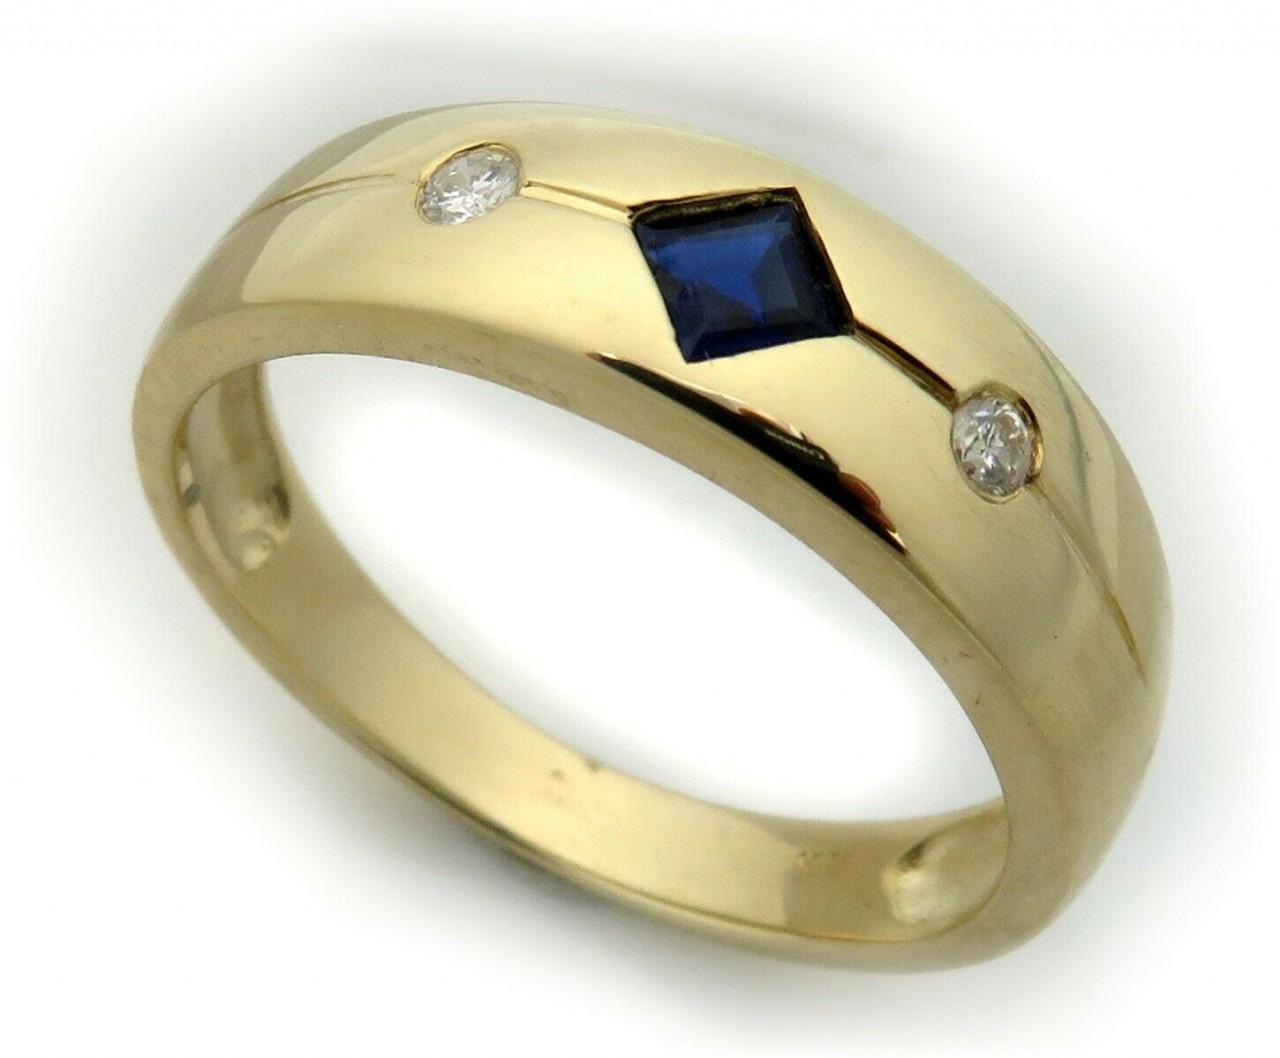 Damen Ring Saphir m. Diamant 0,04ct echt Gold 585 14 karat Gelbgold Brillant Neu